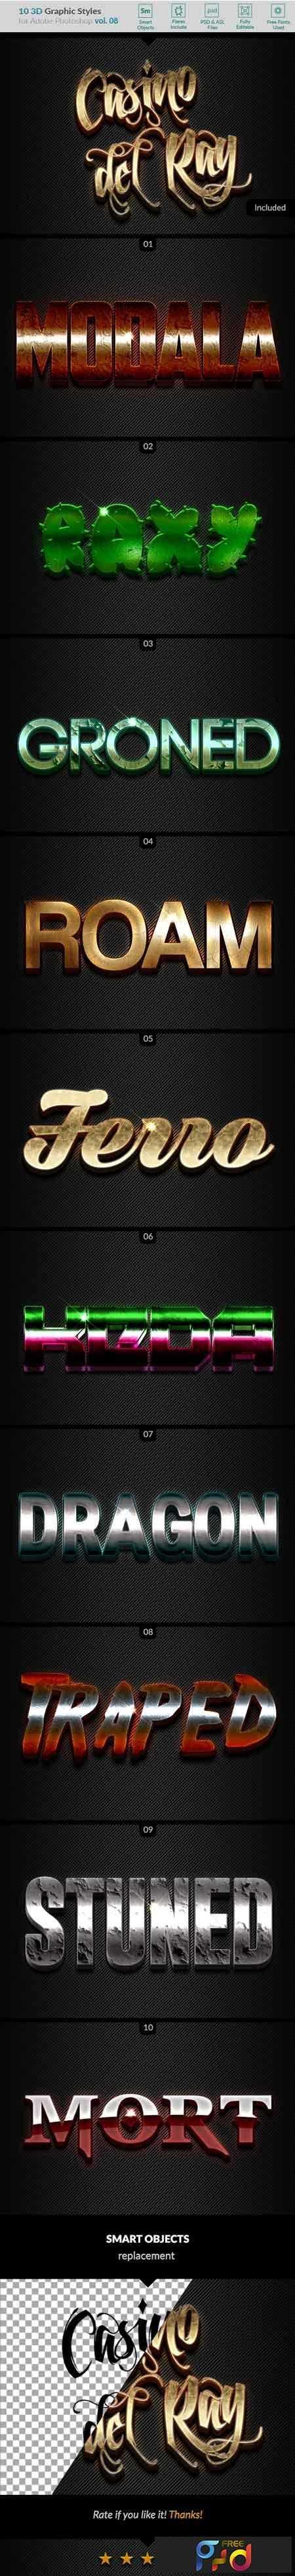 1807104 10 3D Styles Vol 08 22026134 1